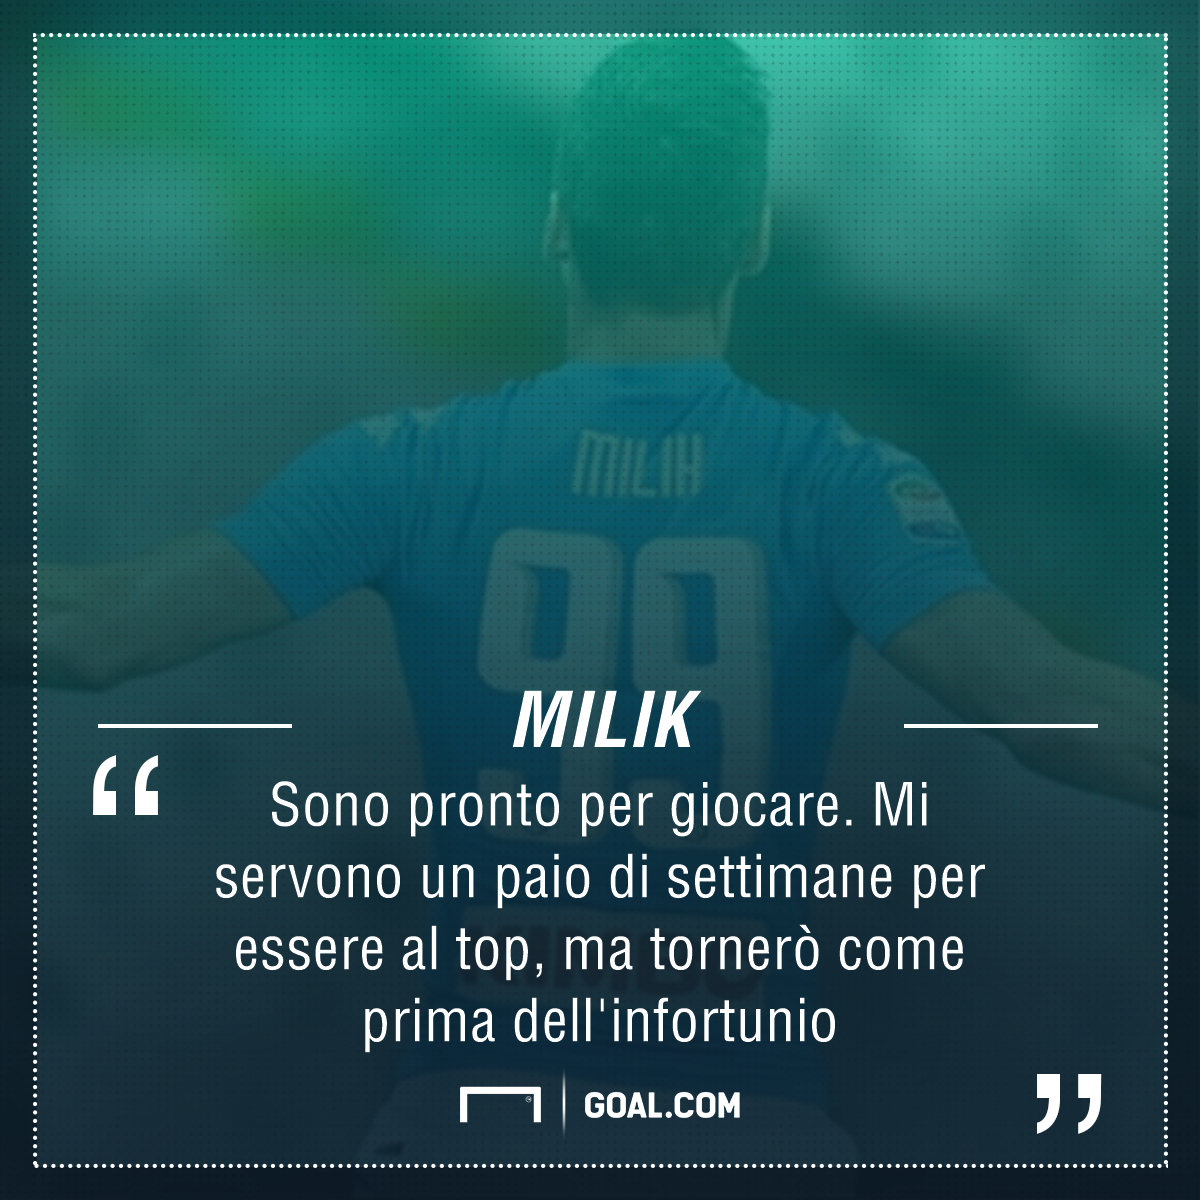 Milik: